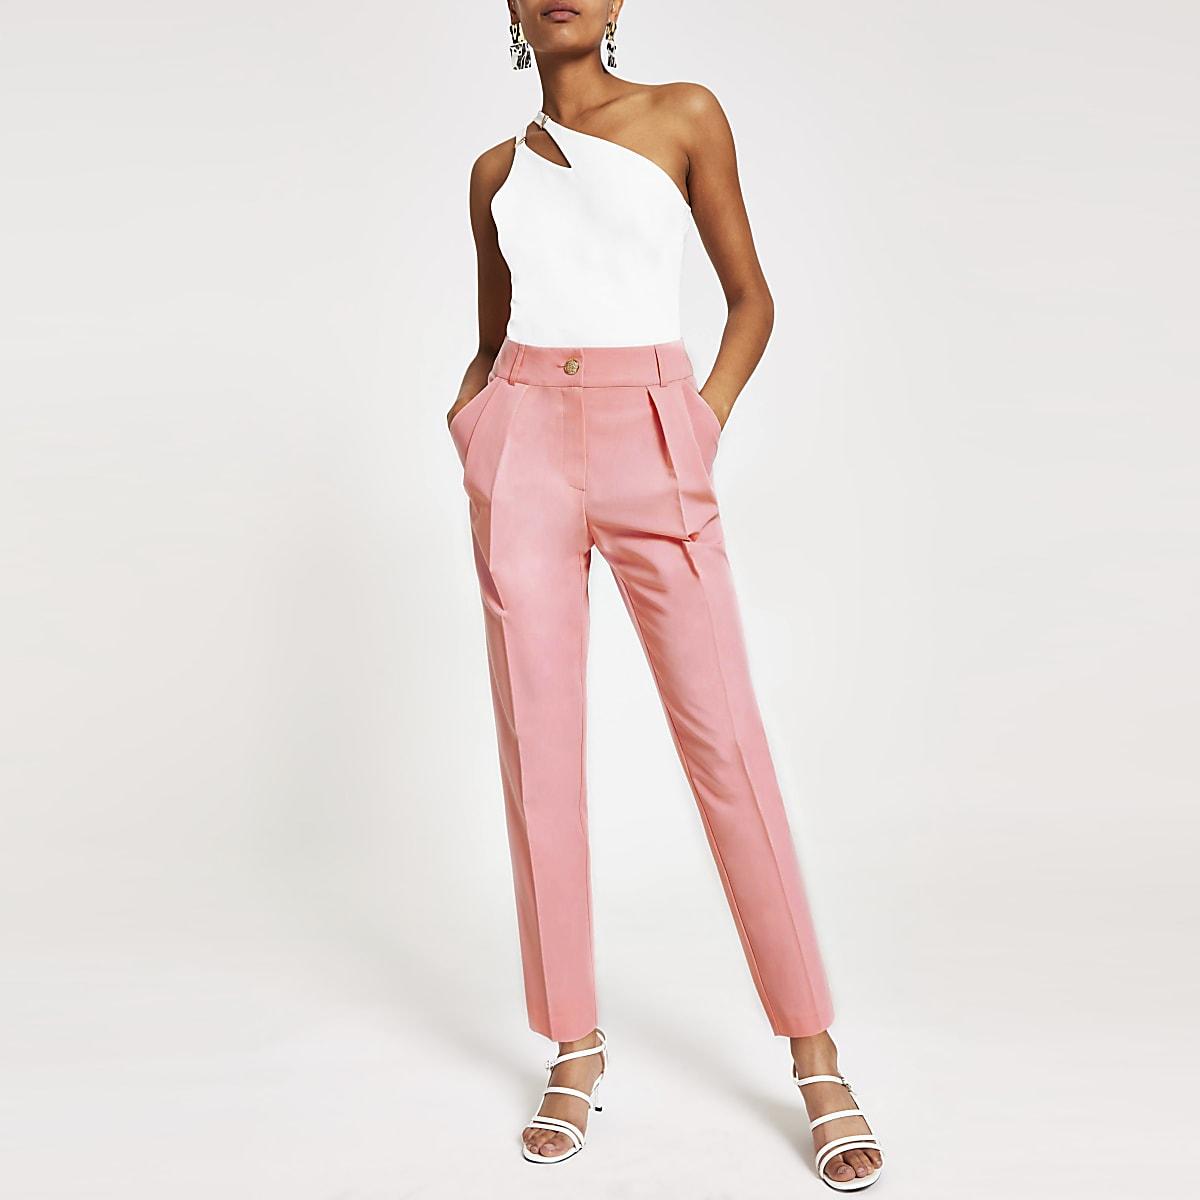 Roze geplooide smaltoelopende broek